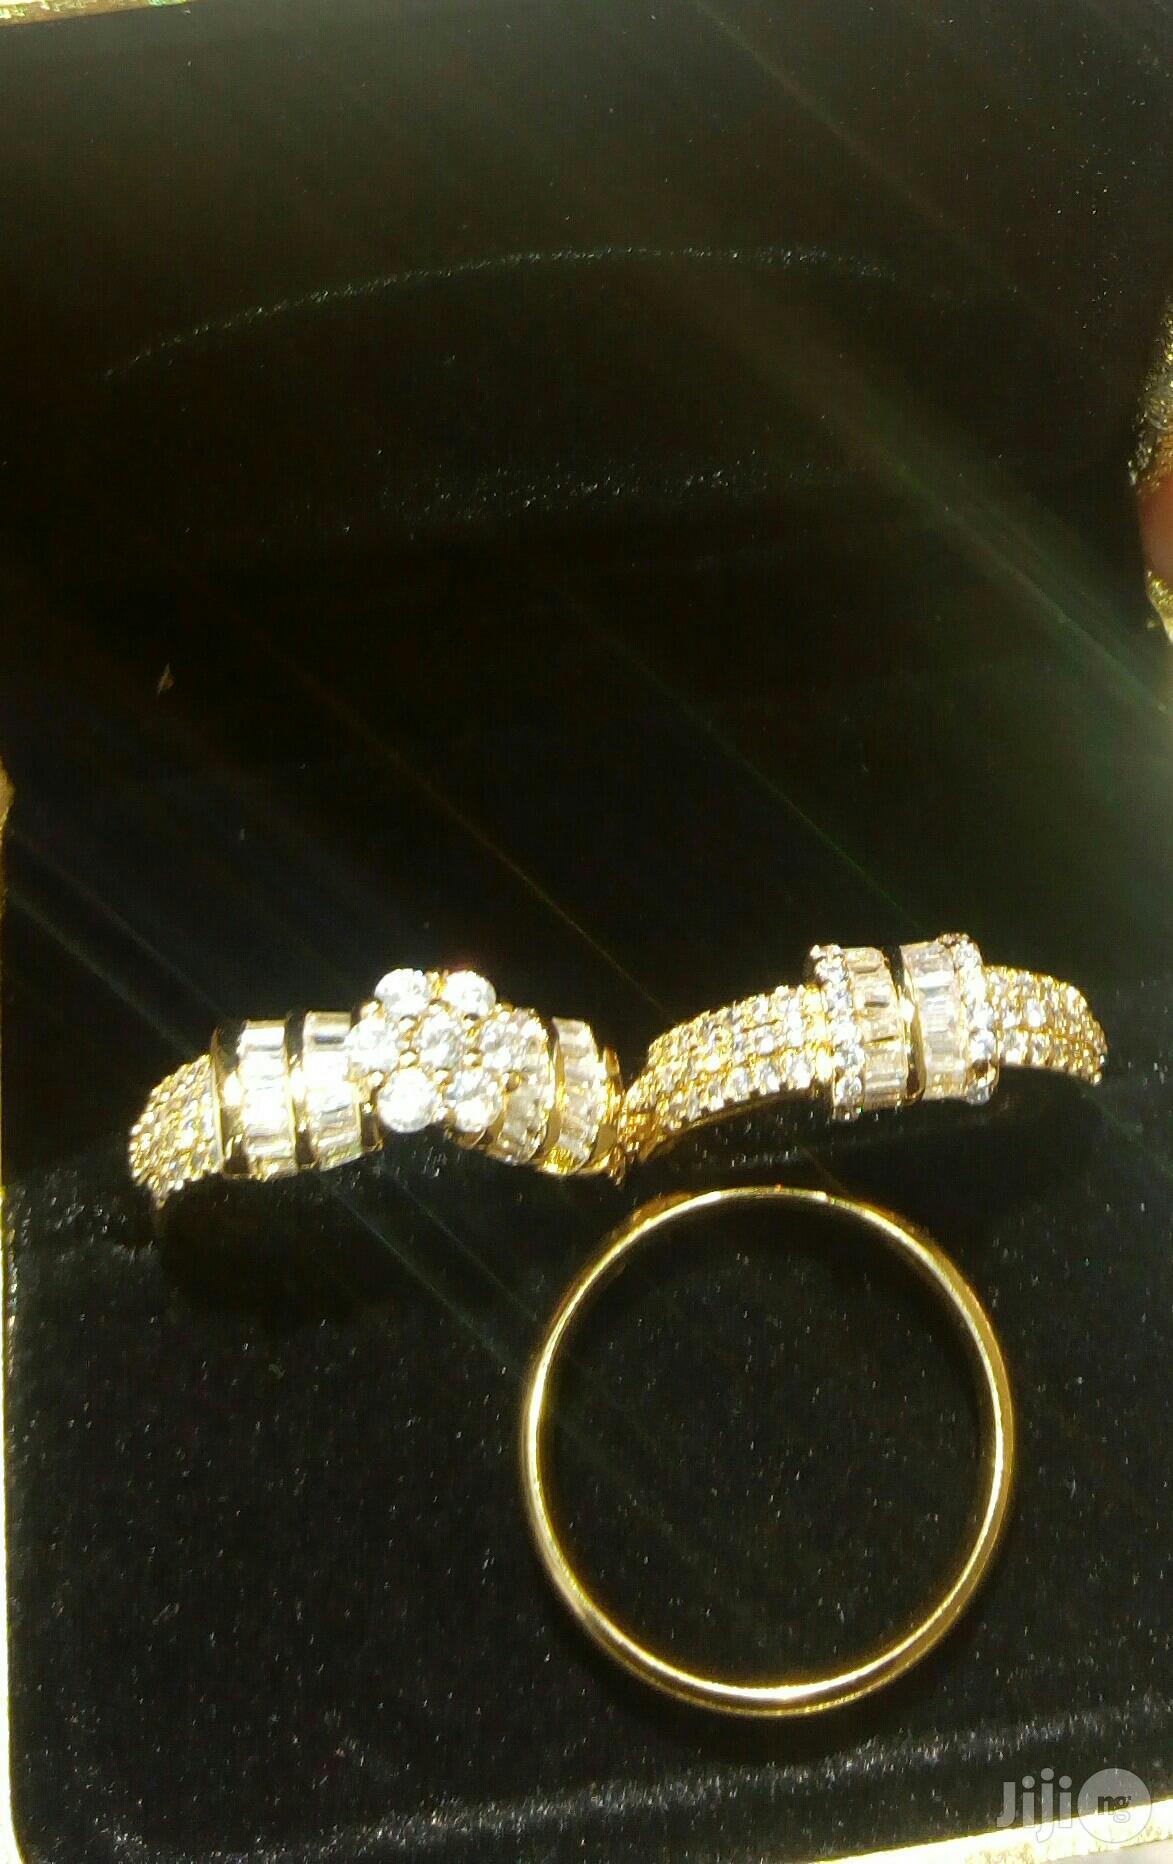 Romania Gold Wedding Rings